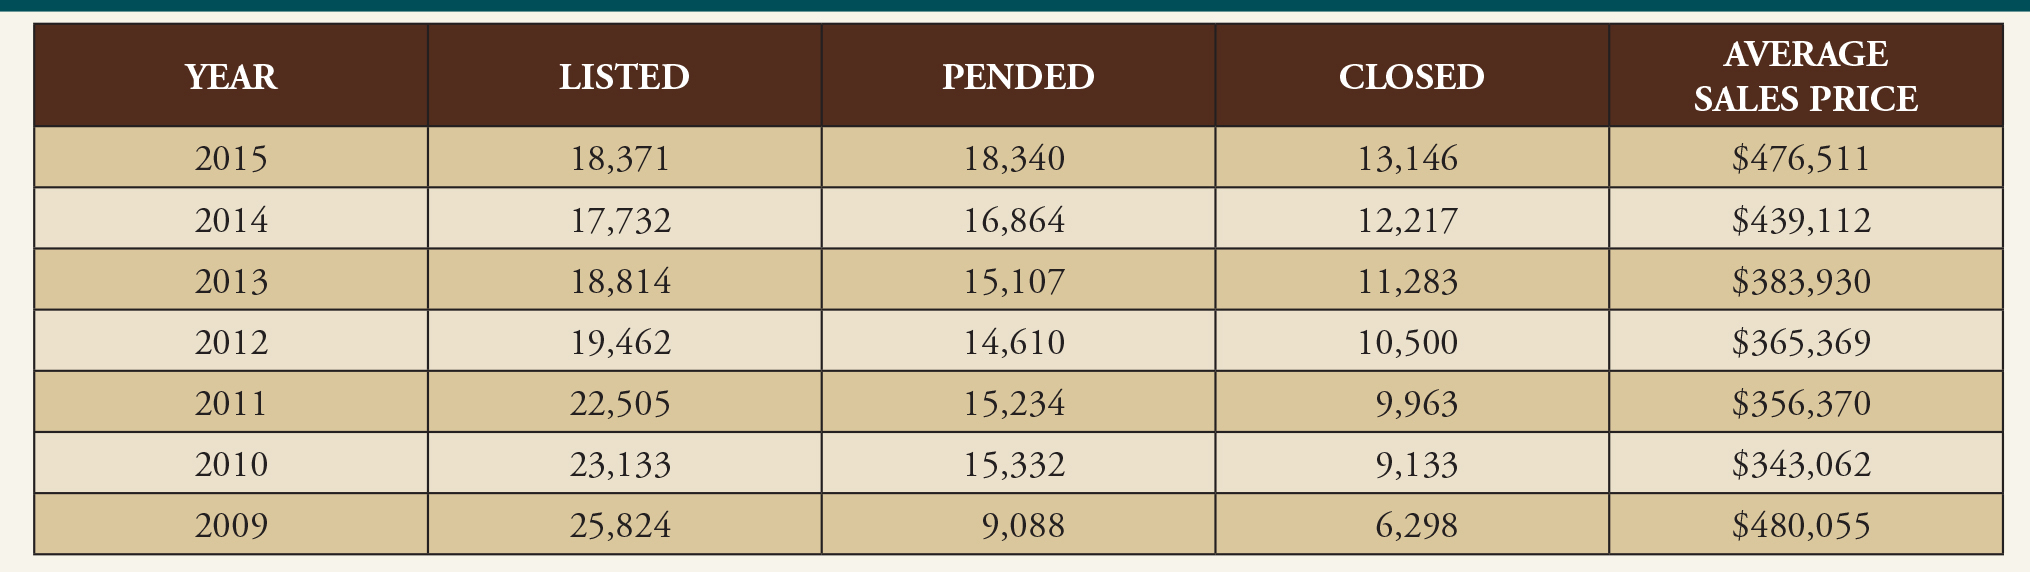 Market Report JAN 2015.indd